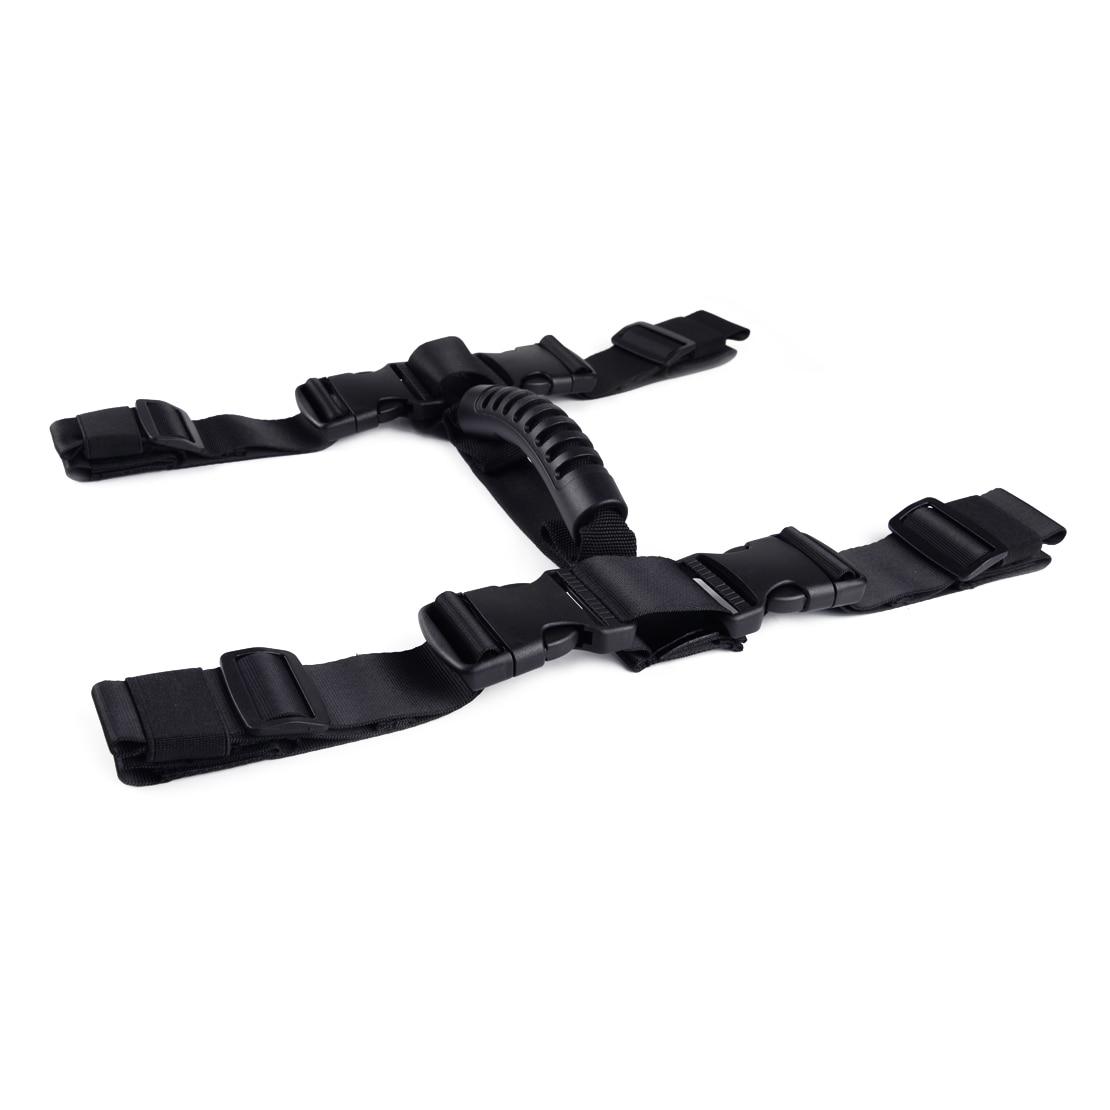 DWCX Car Side Box Pannier Rope String Handle Black Fit For BMW R1200GS LC ADV Adventure F700GS F800GS